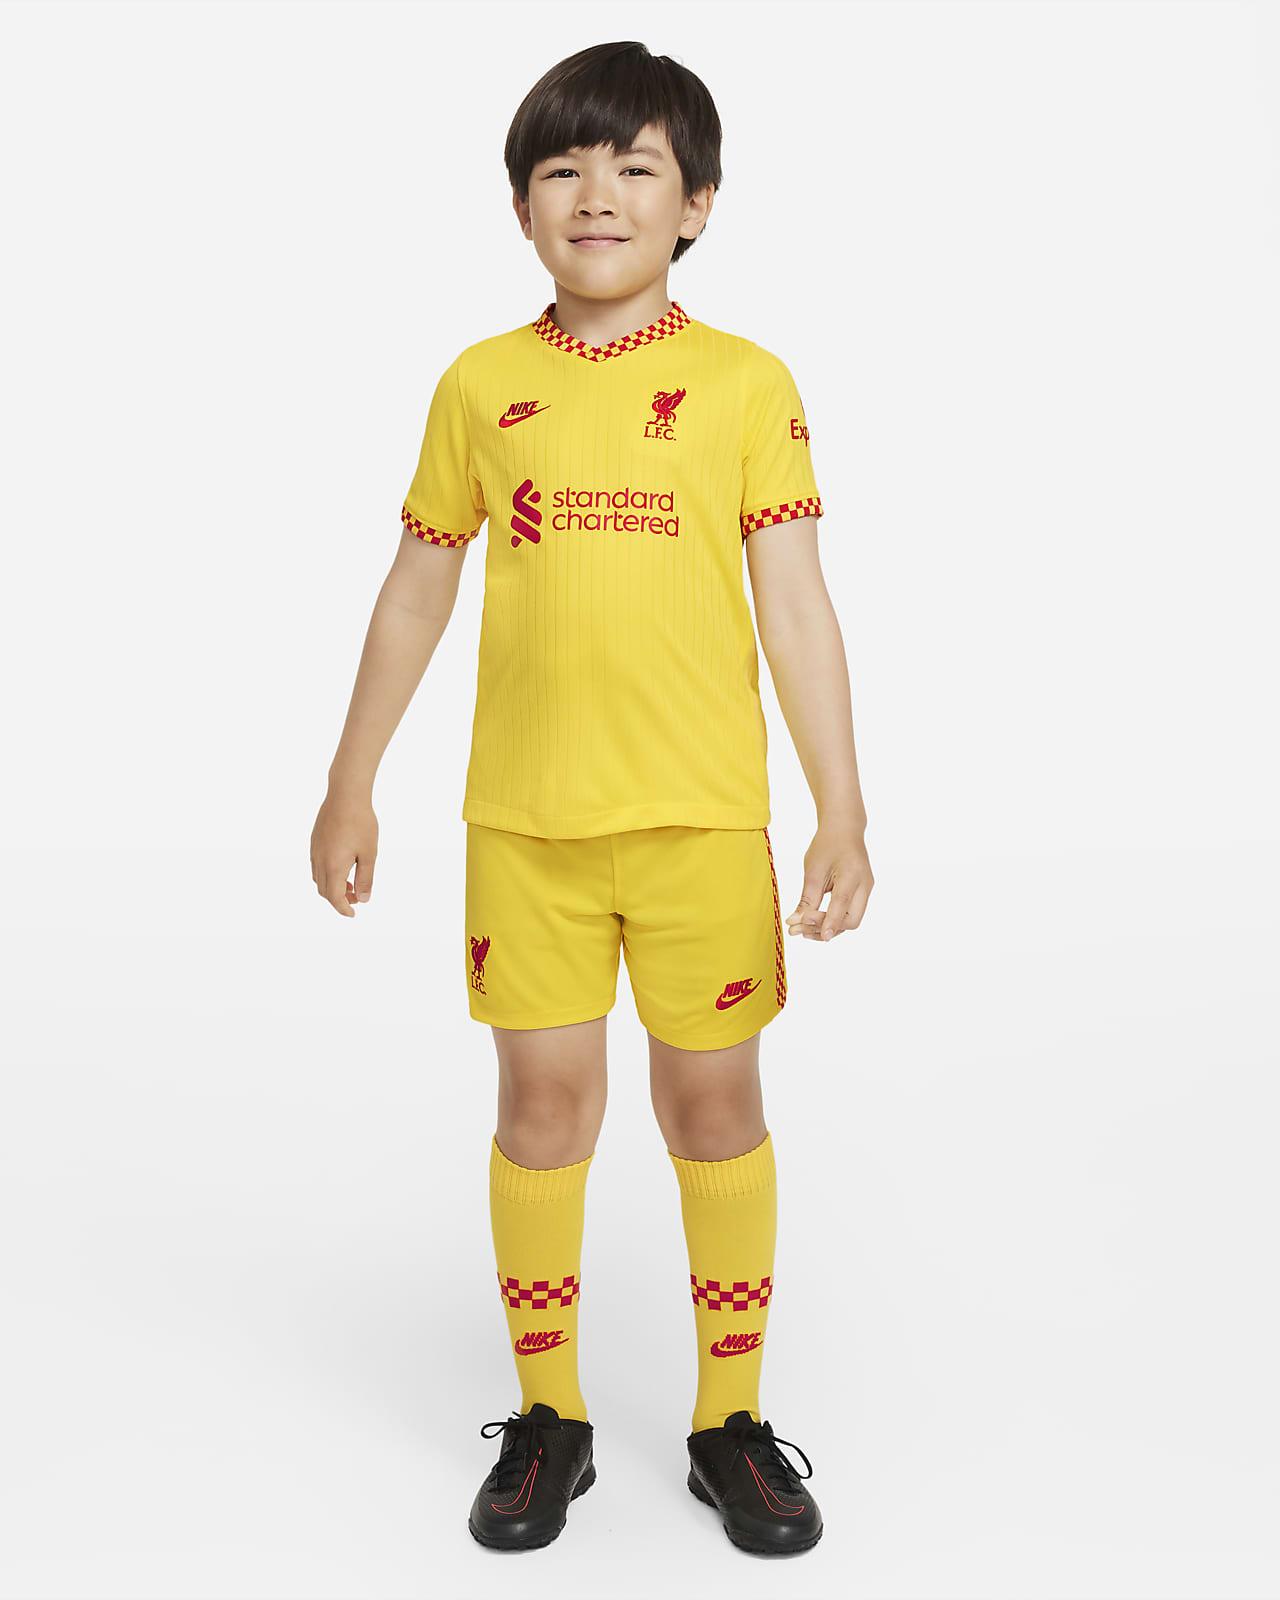 Liverpool FC 2021/22 Third Nike Dri-FIT voetbaltenue voor kleuters